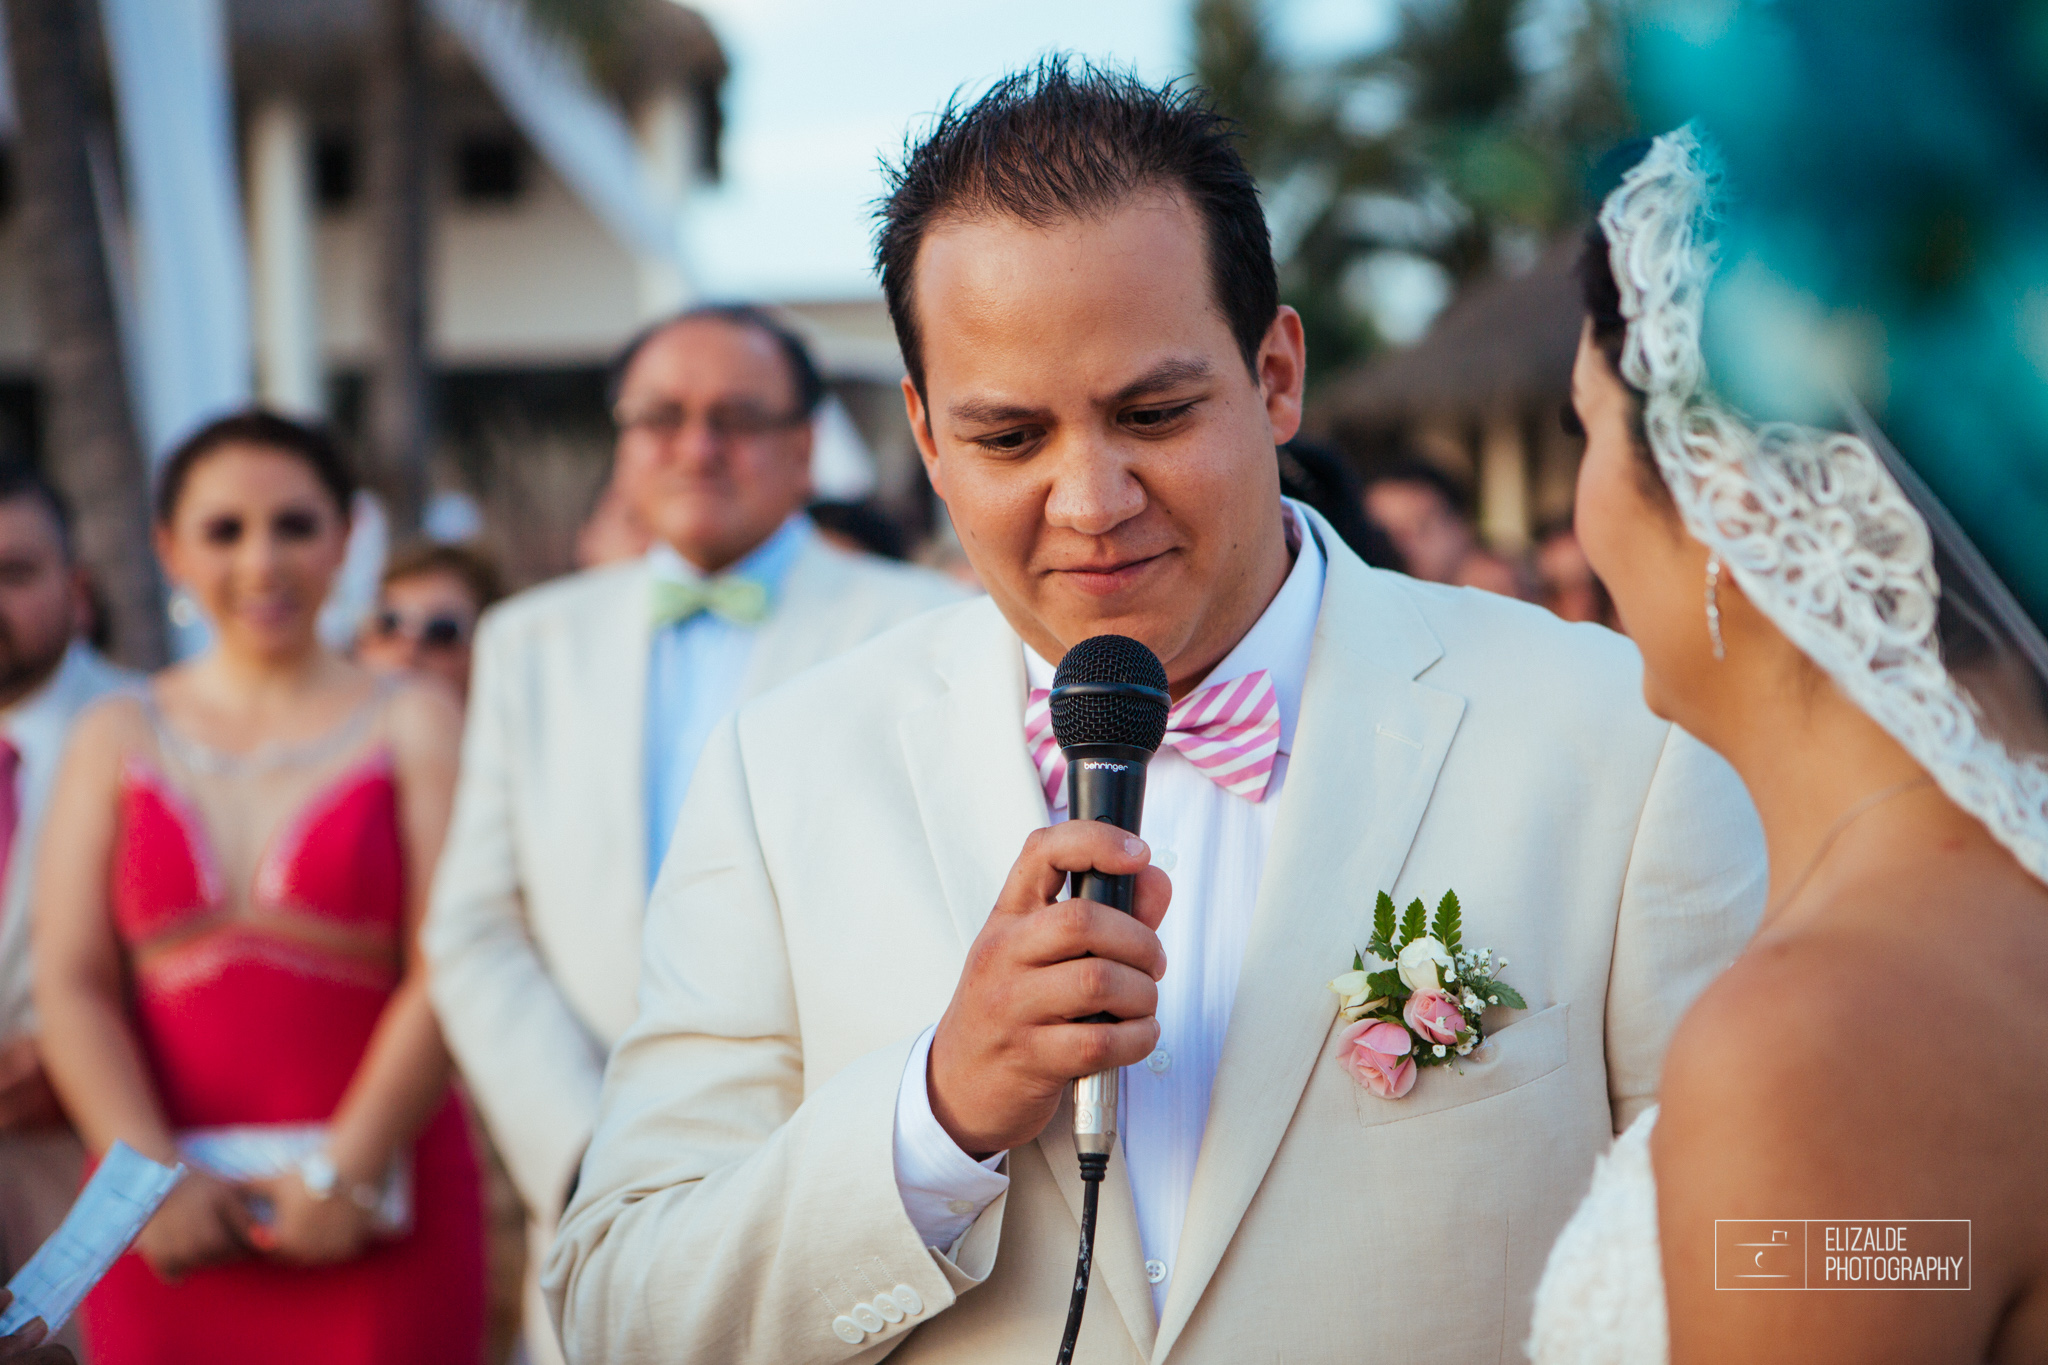 Pay and Ferran_Acapulco_Destination Wedding_Elizalde Photography-94.jpg